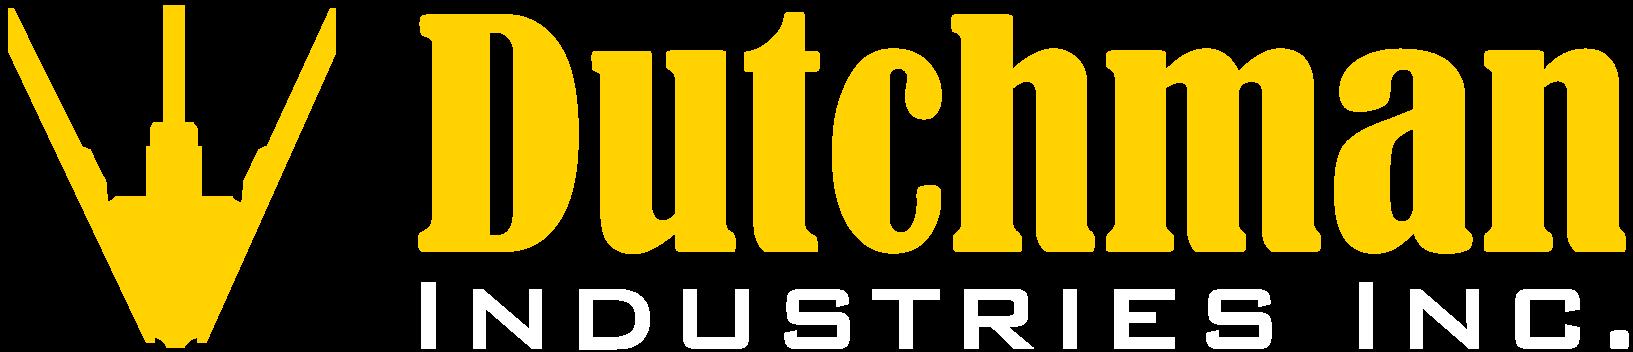 Dutchman Industries Inc.